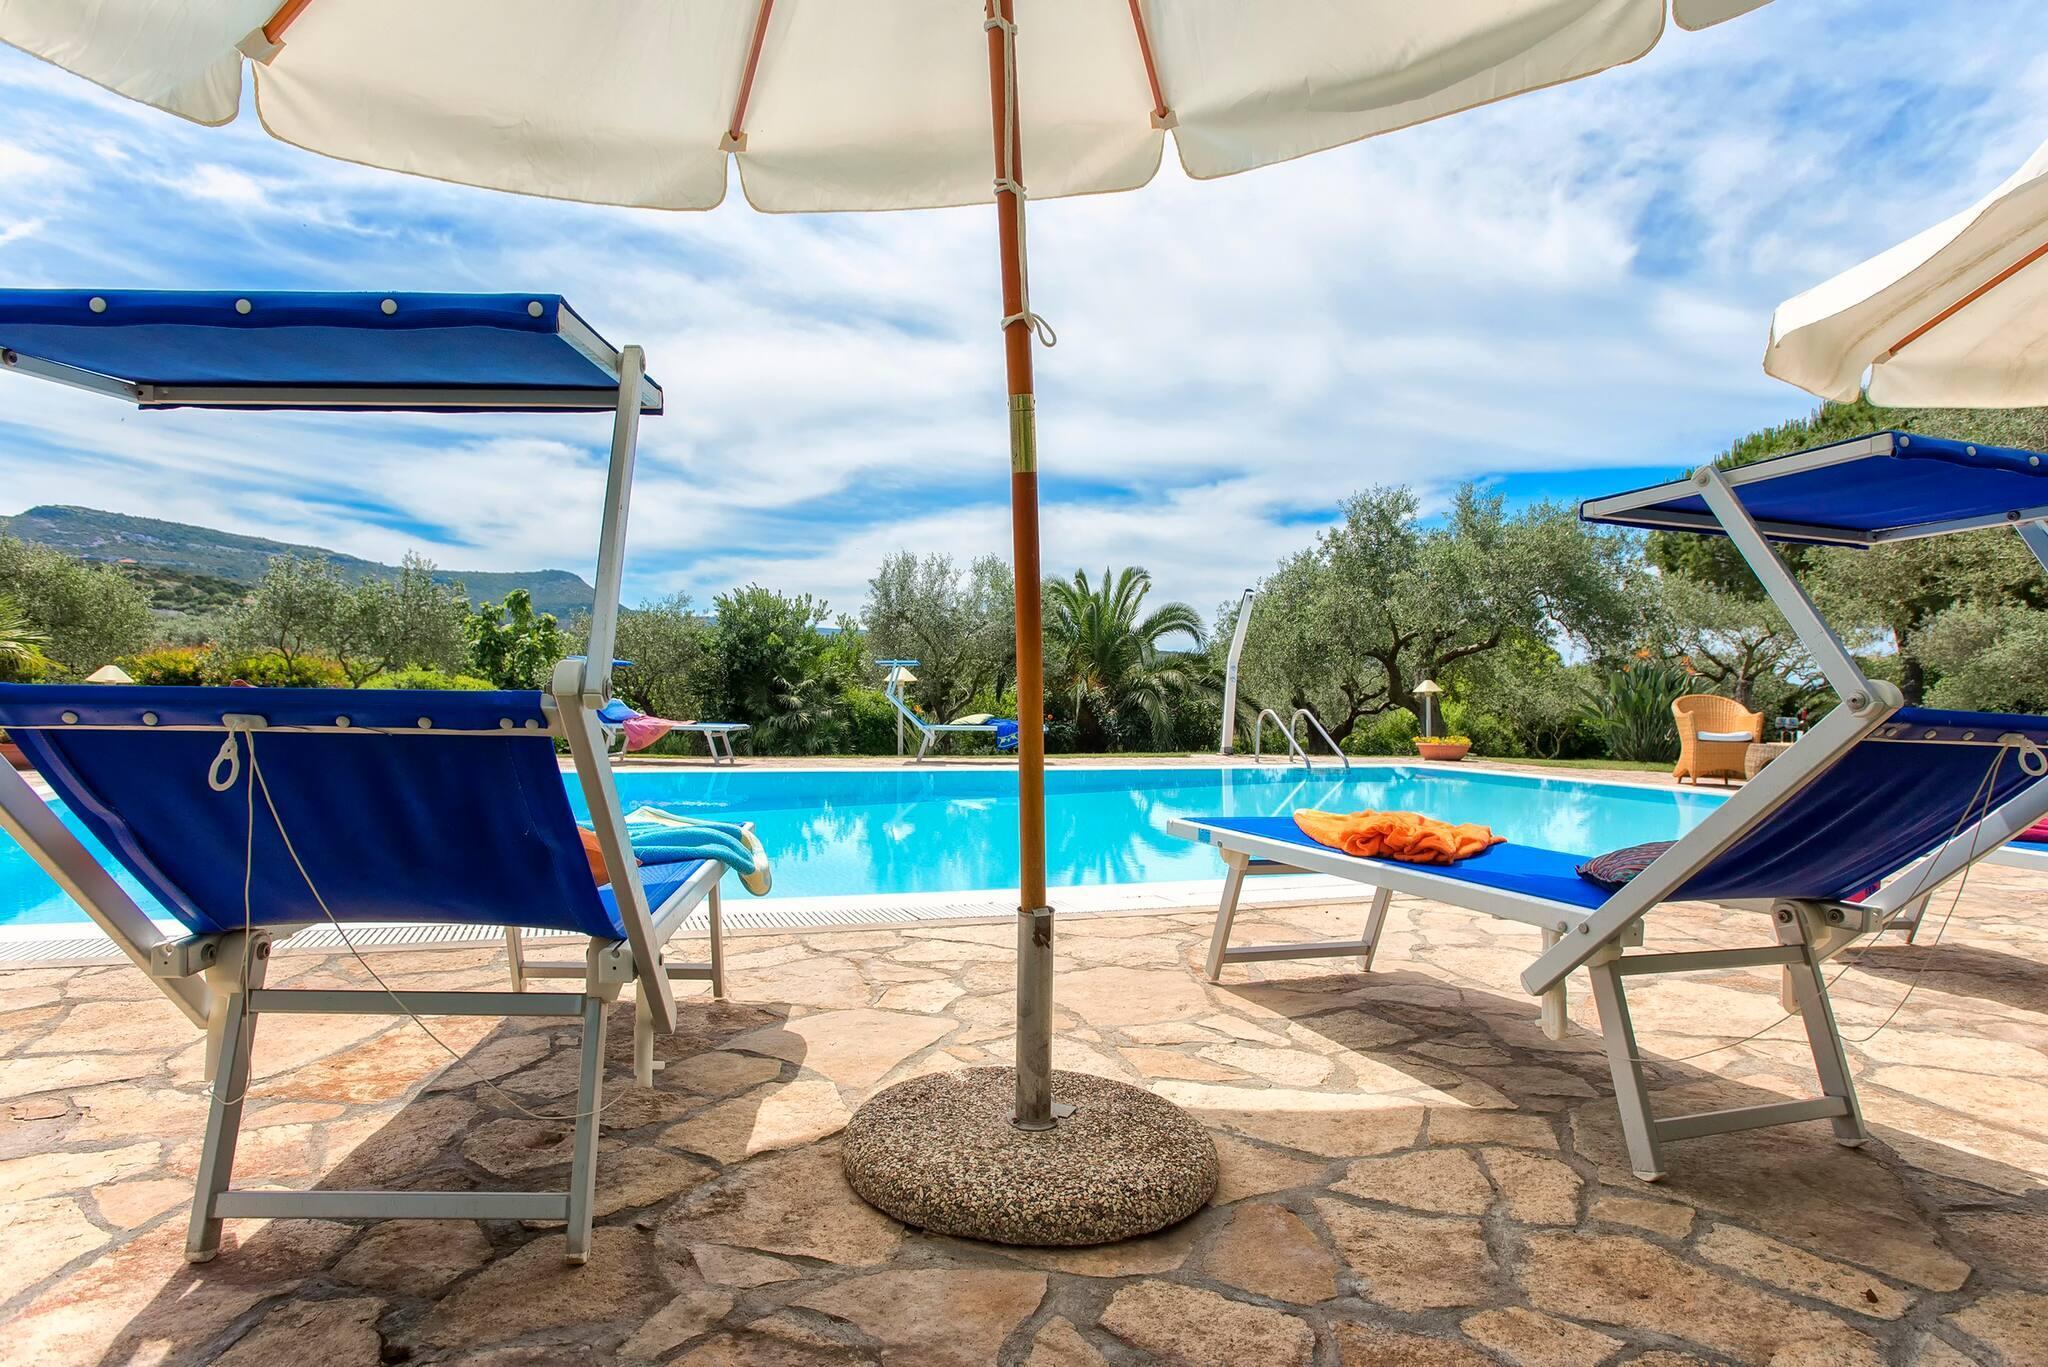 Alghero, Villa Smeralda with independent swimming pool